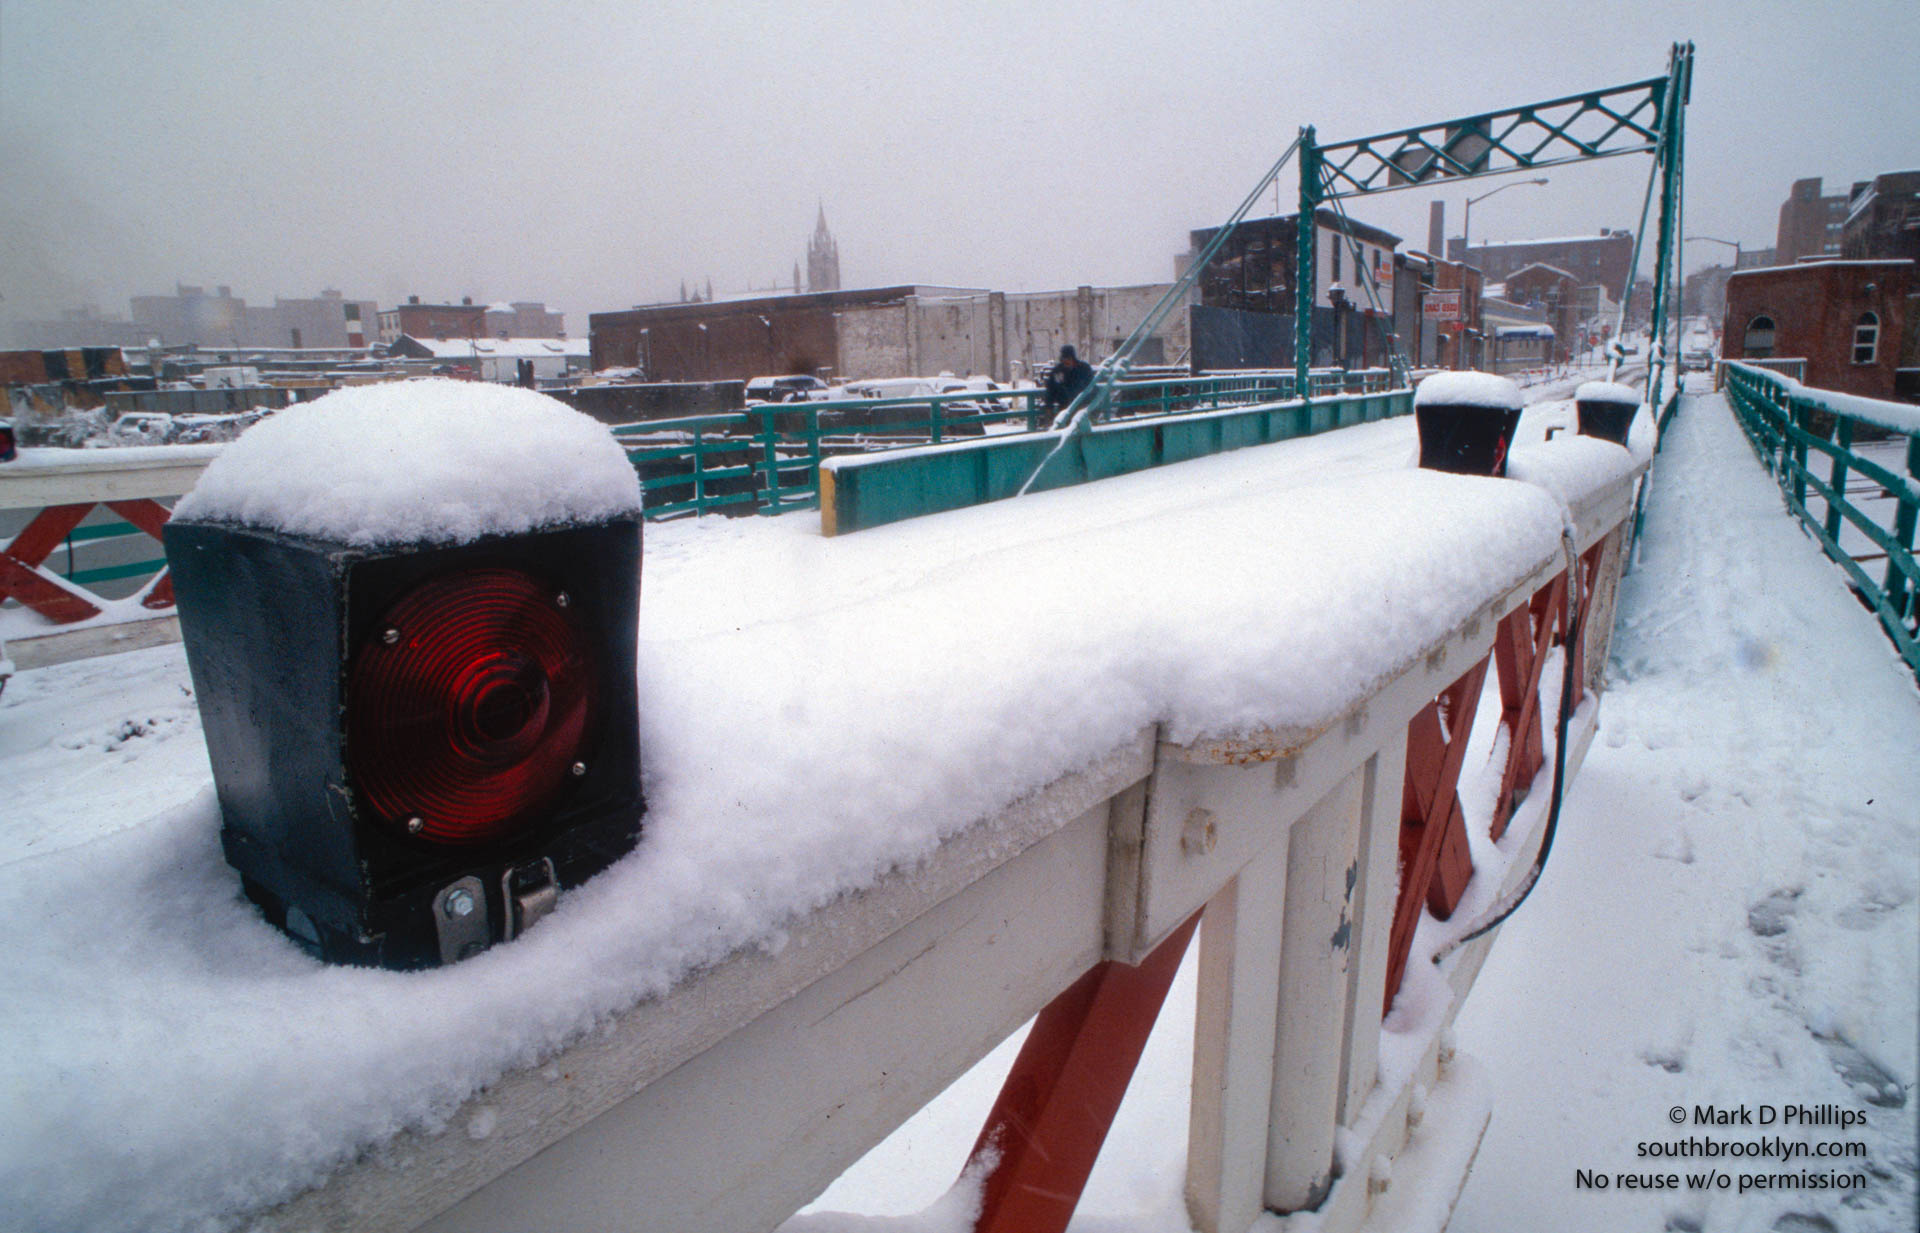 Carroll Street Bridge in the snow over the Gowanus Canal in Brooklyn, NY